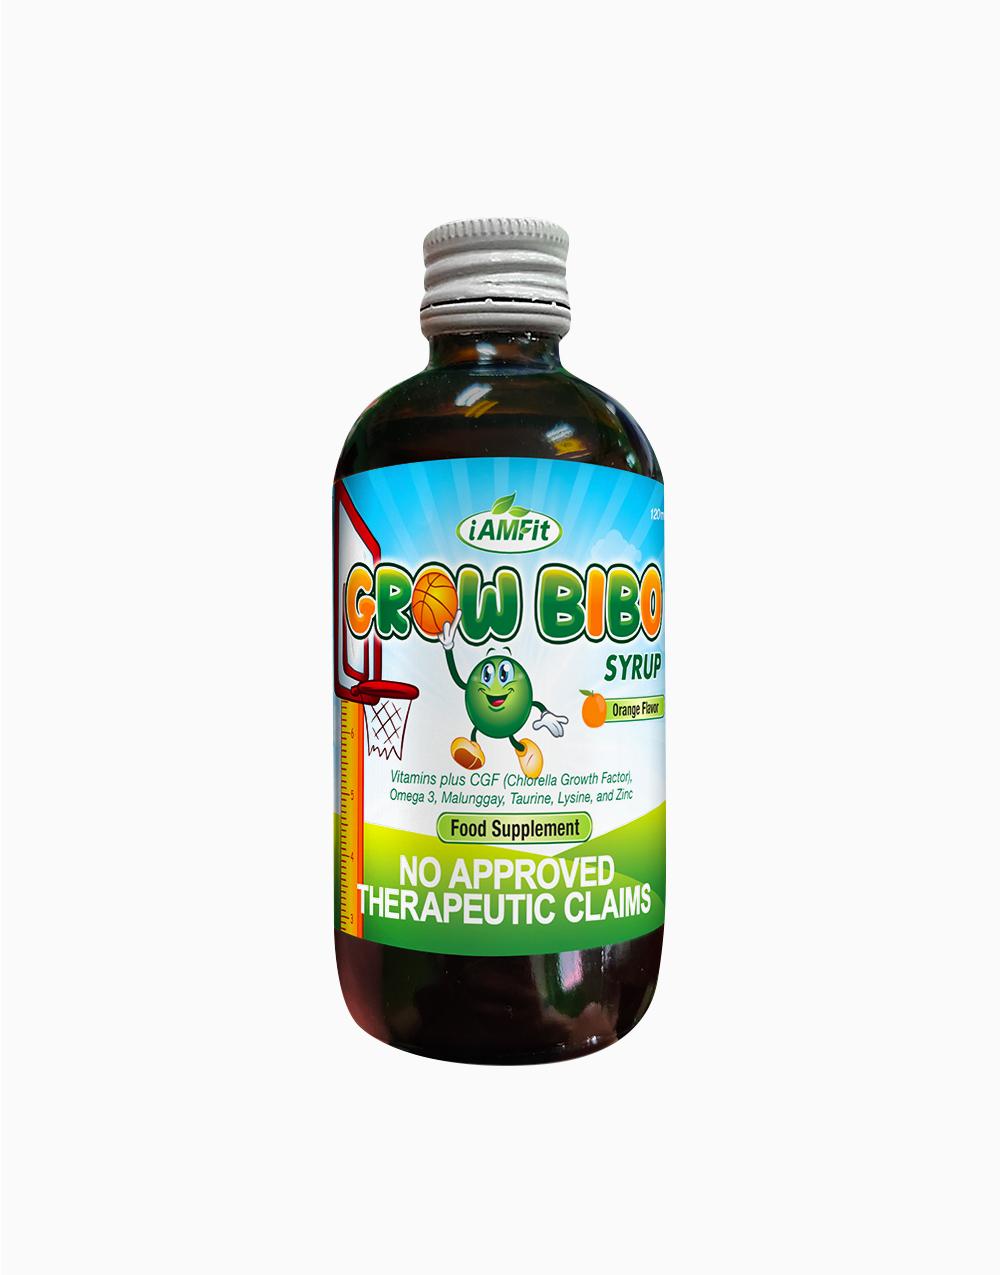 iAMFit GrowBibo Syrup (120ml) by iAMFit